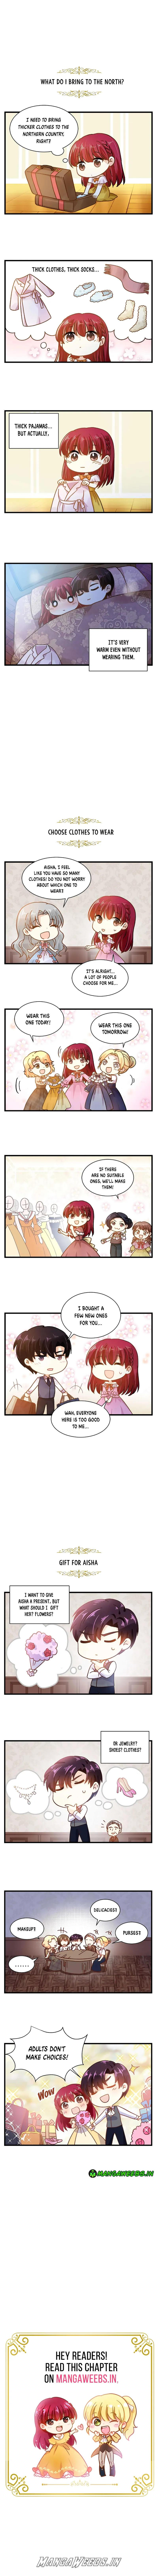 The Evil Lady Will Change Chapter 100.3 page 1 - Mangakakalots.com